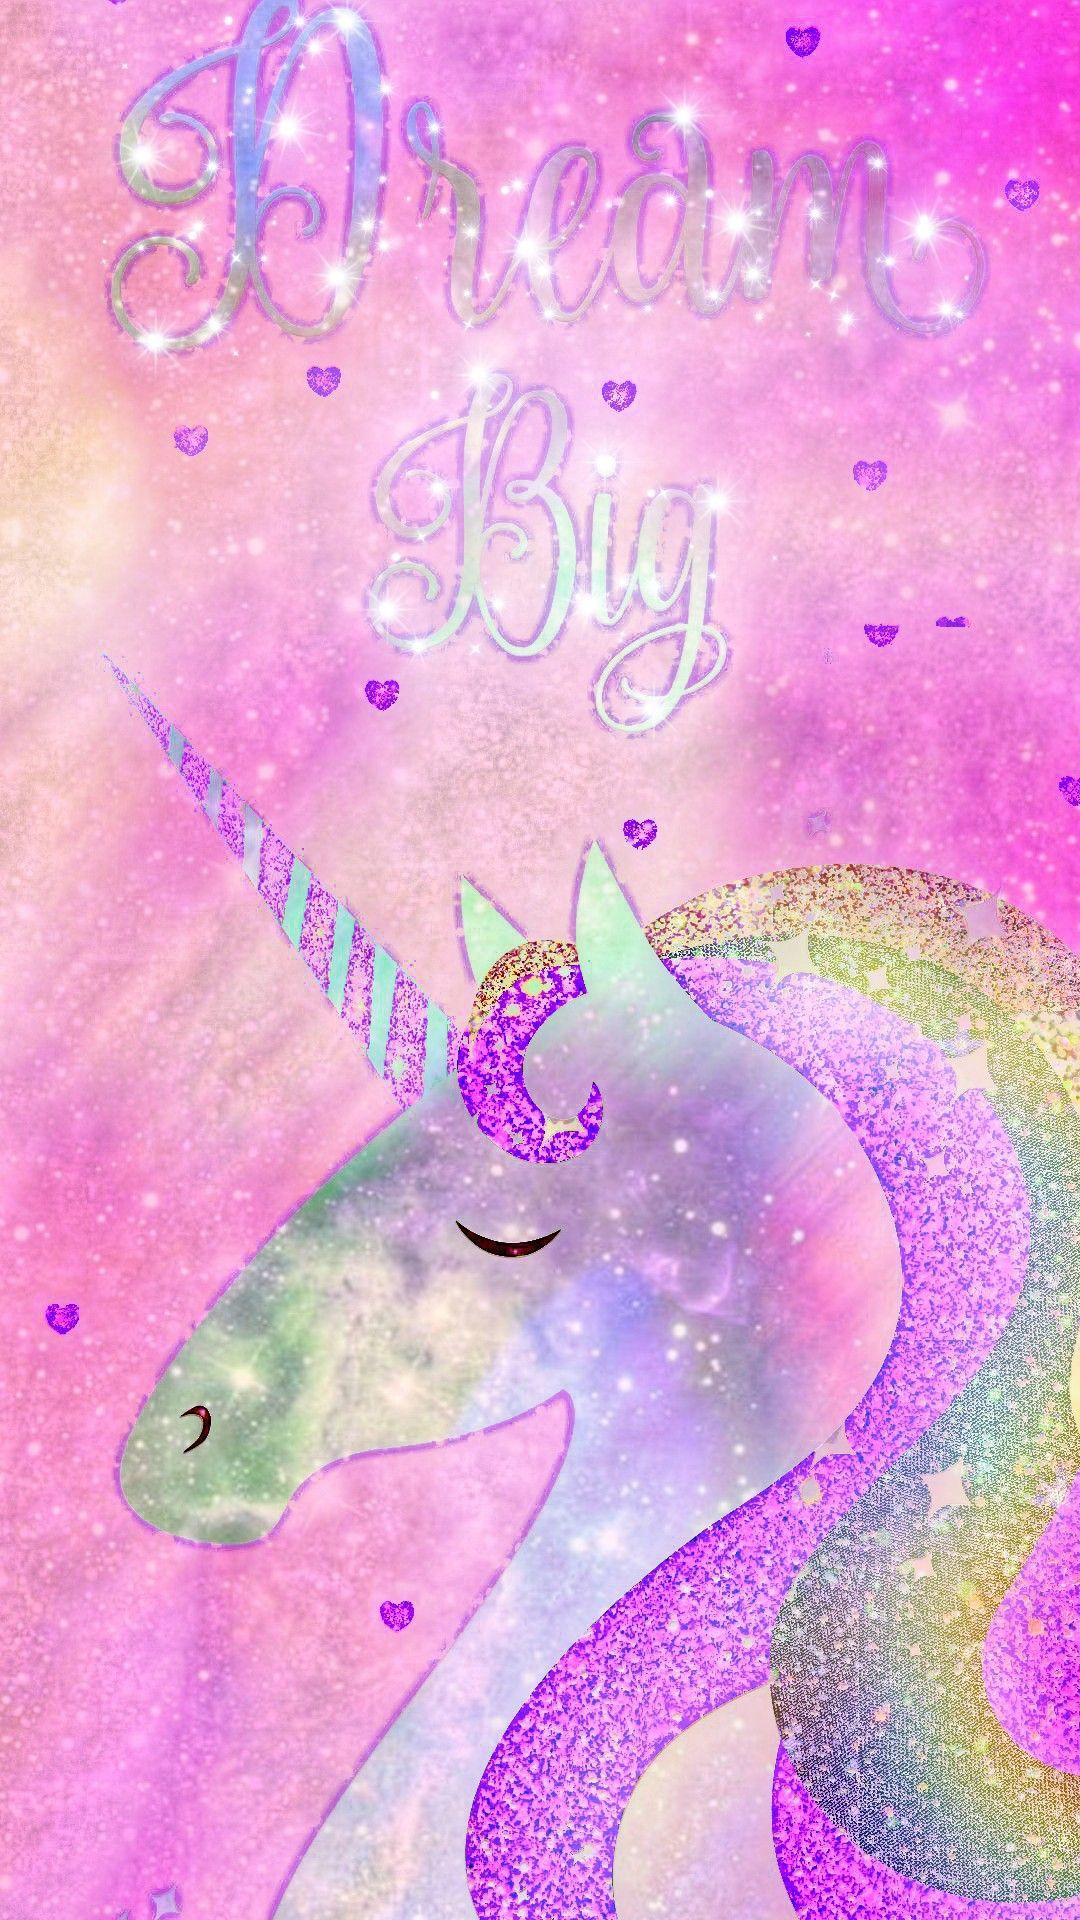 Dream Big Unicorn Made By Me Pastel Kawaii Fantasy Unicorn Pink Galaxy Wallpaper Unicorn Wallpaper Pink Unicorn Wallpaper Mermaid Wallpaper Backgrounds